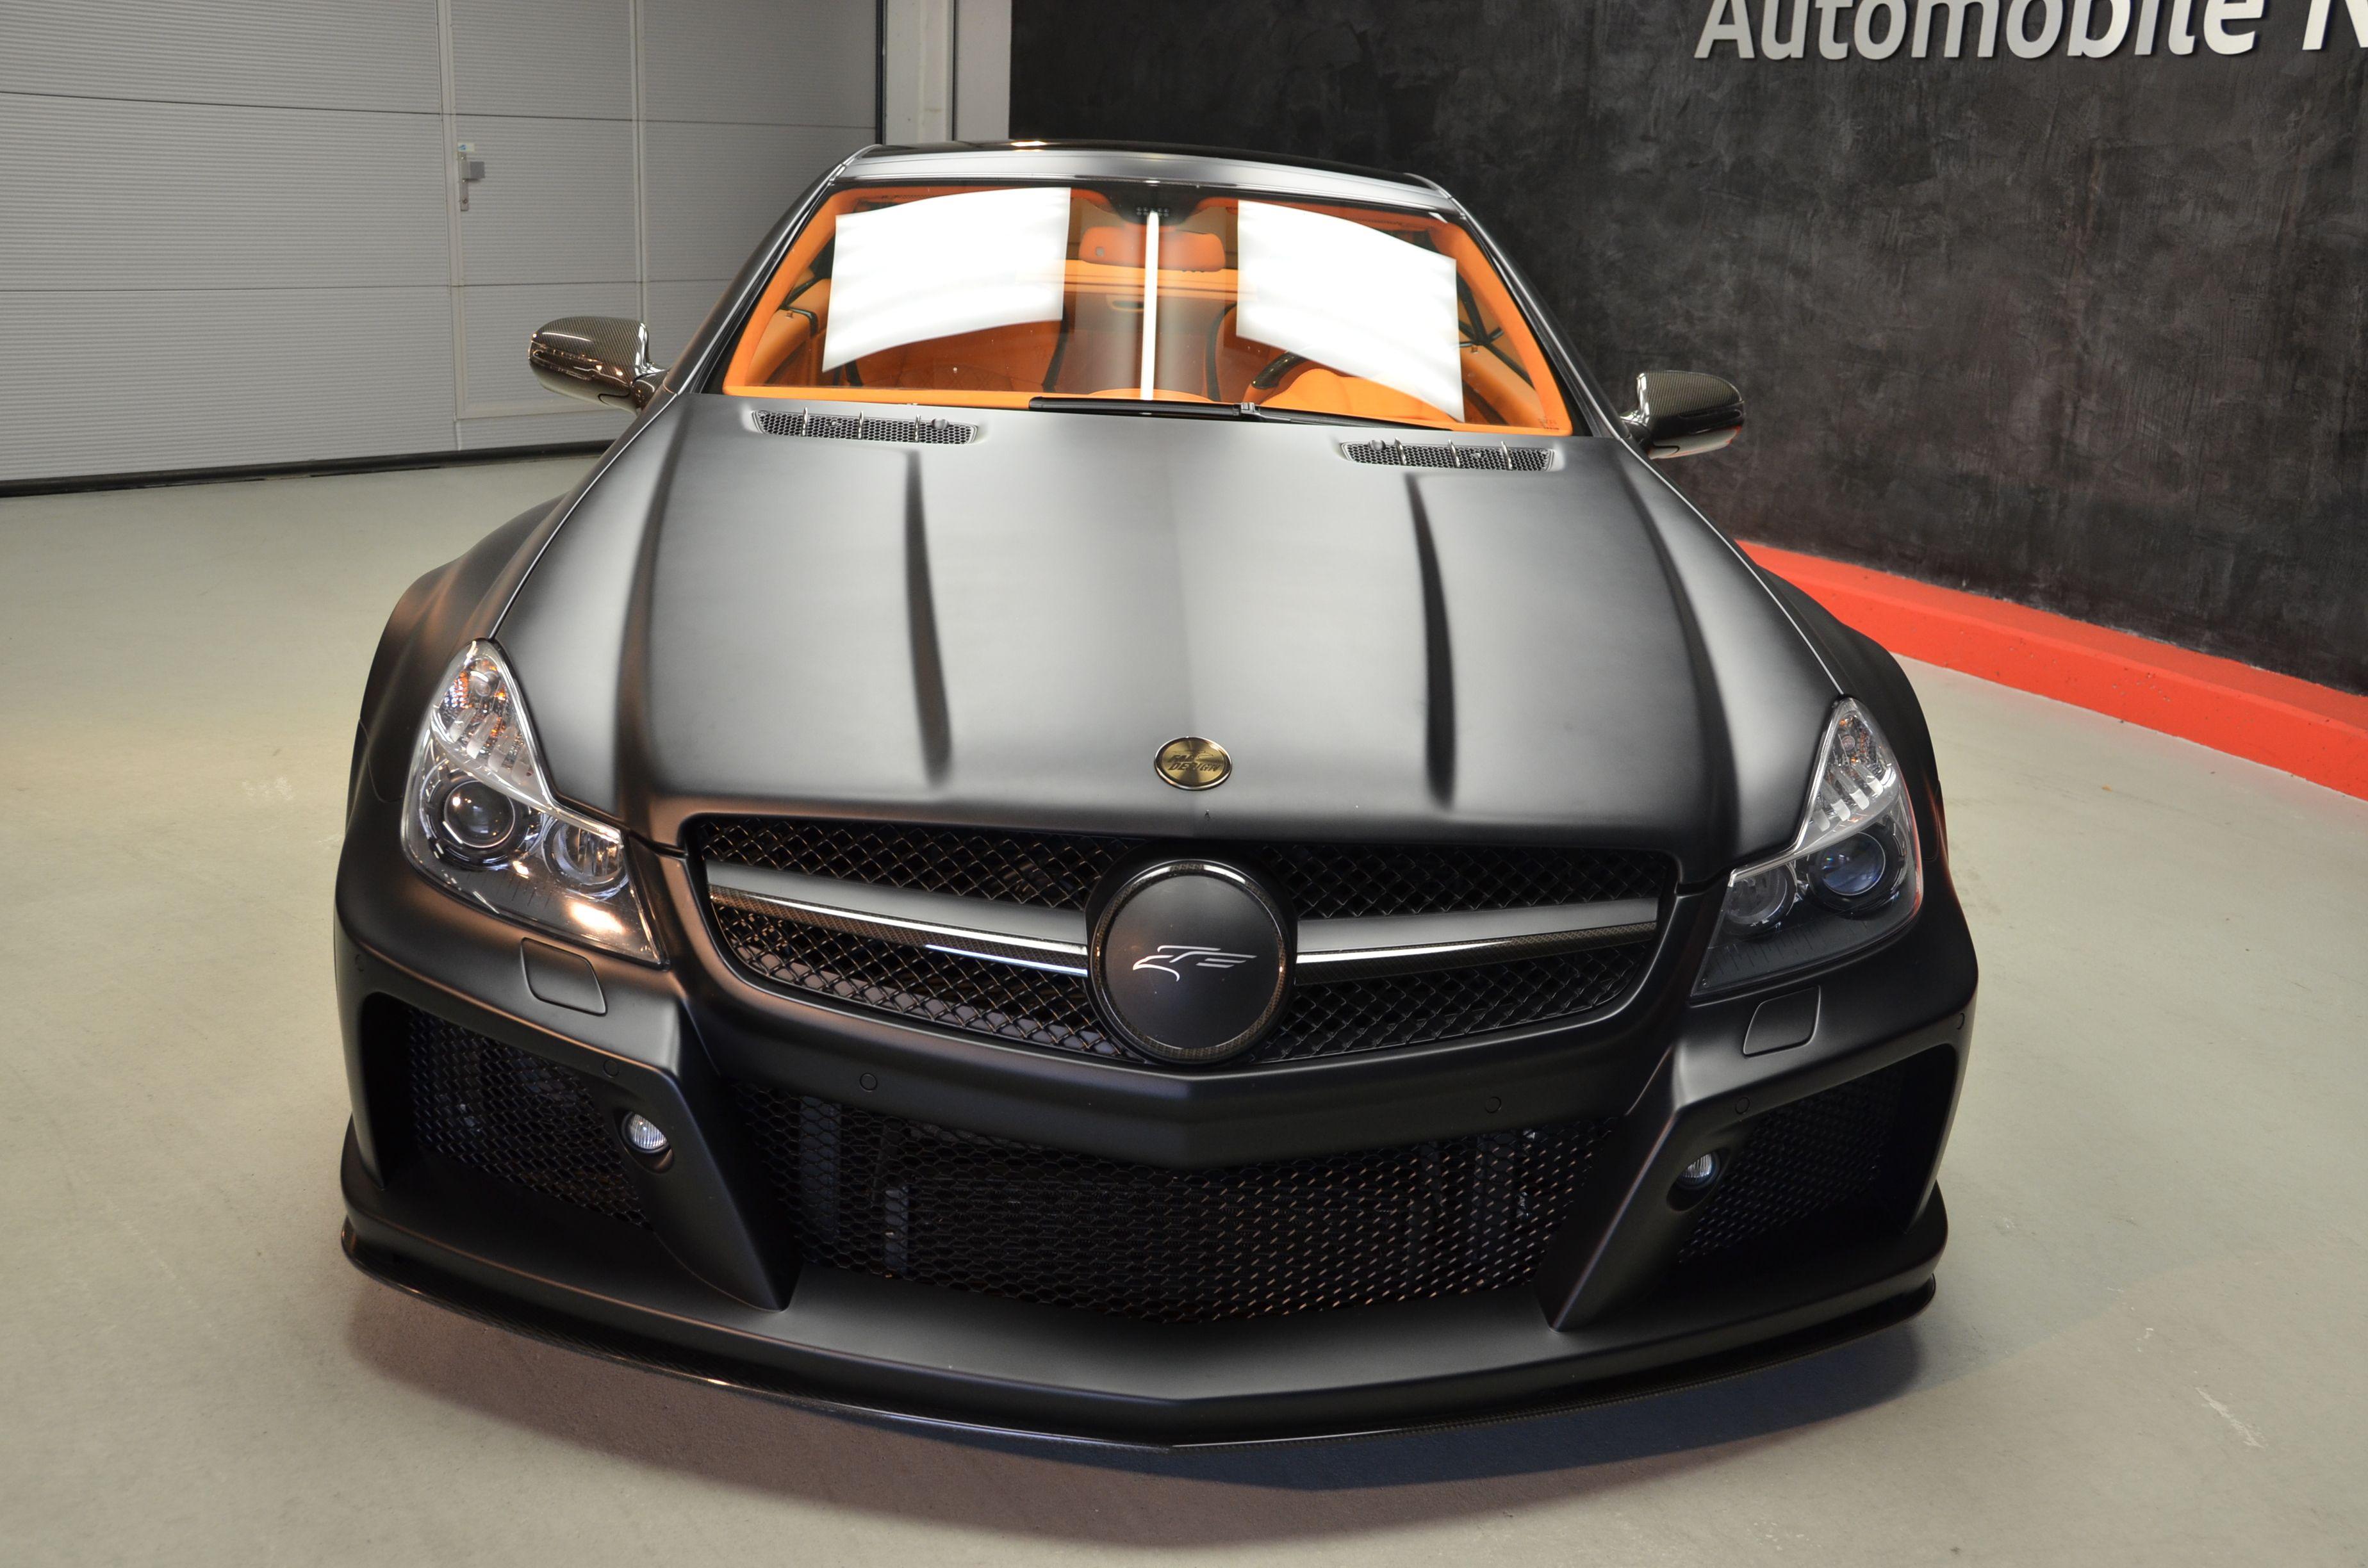 Mercedes sl r230 sr66 suhorovsky design das automobil pinterest wide body kits mercedes benz and cars